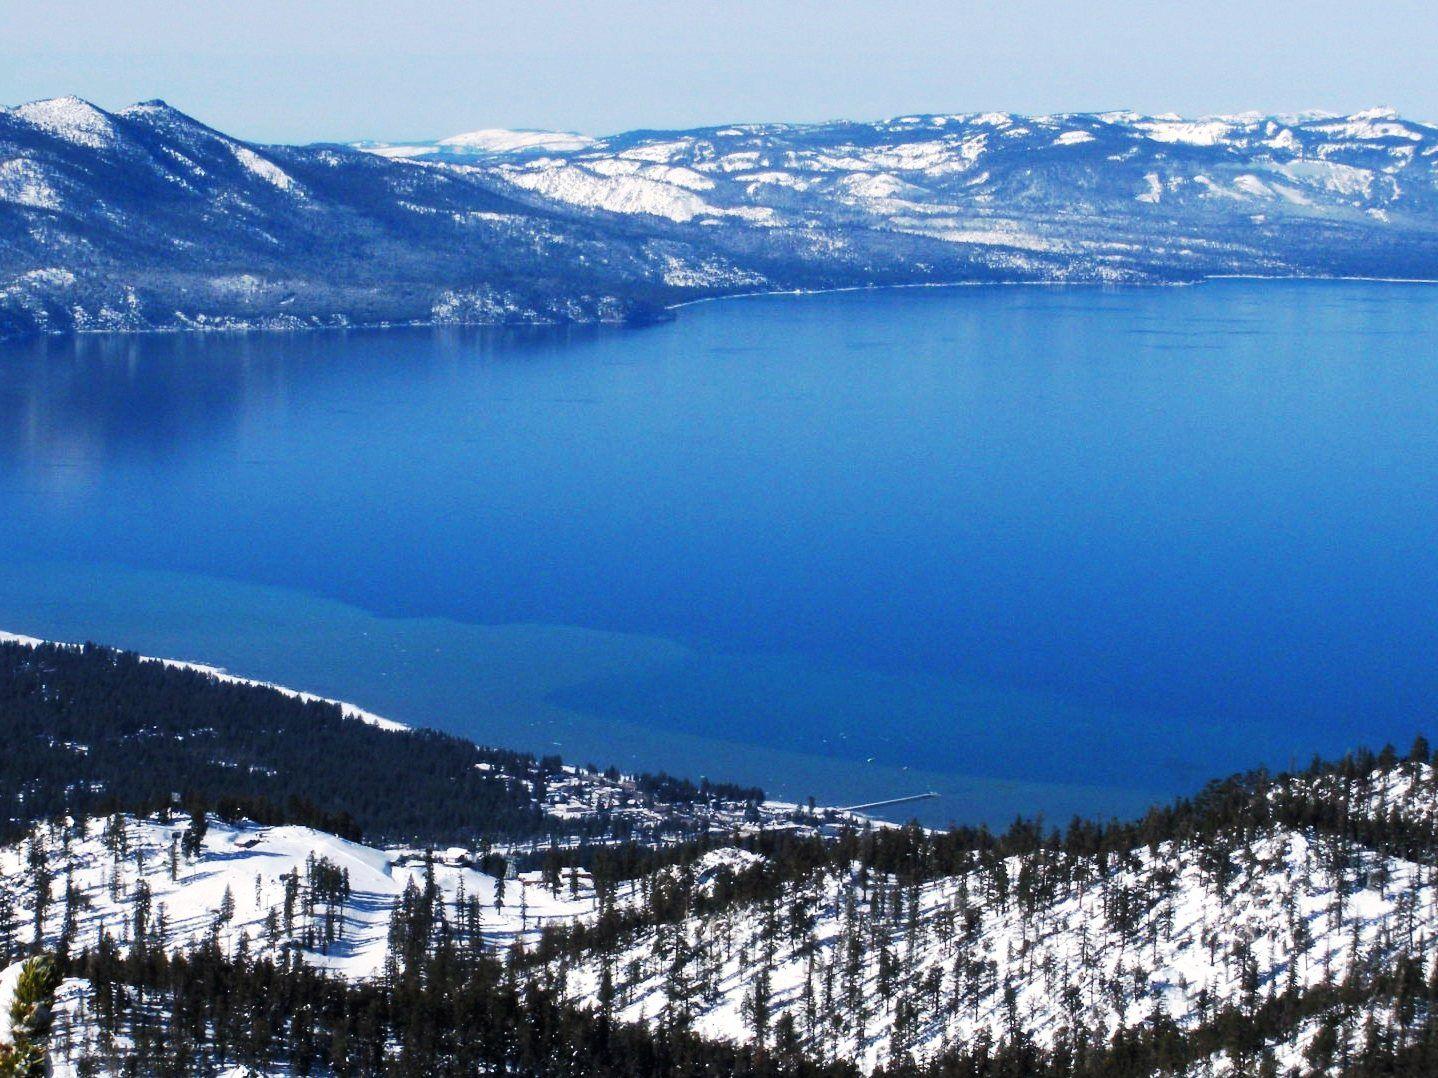 heavenly ski resort, lake tahoe, ca | favorite places and spaces